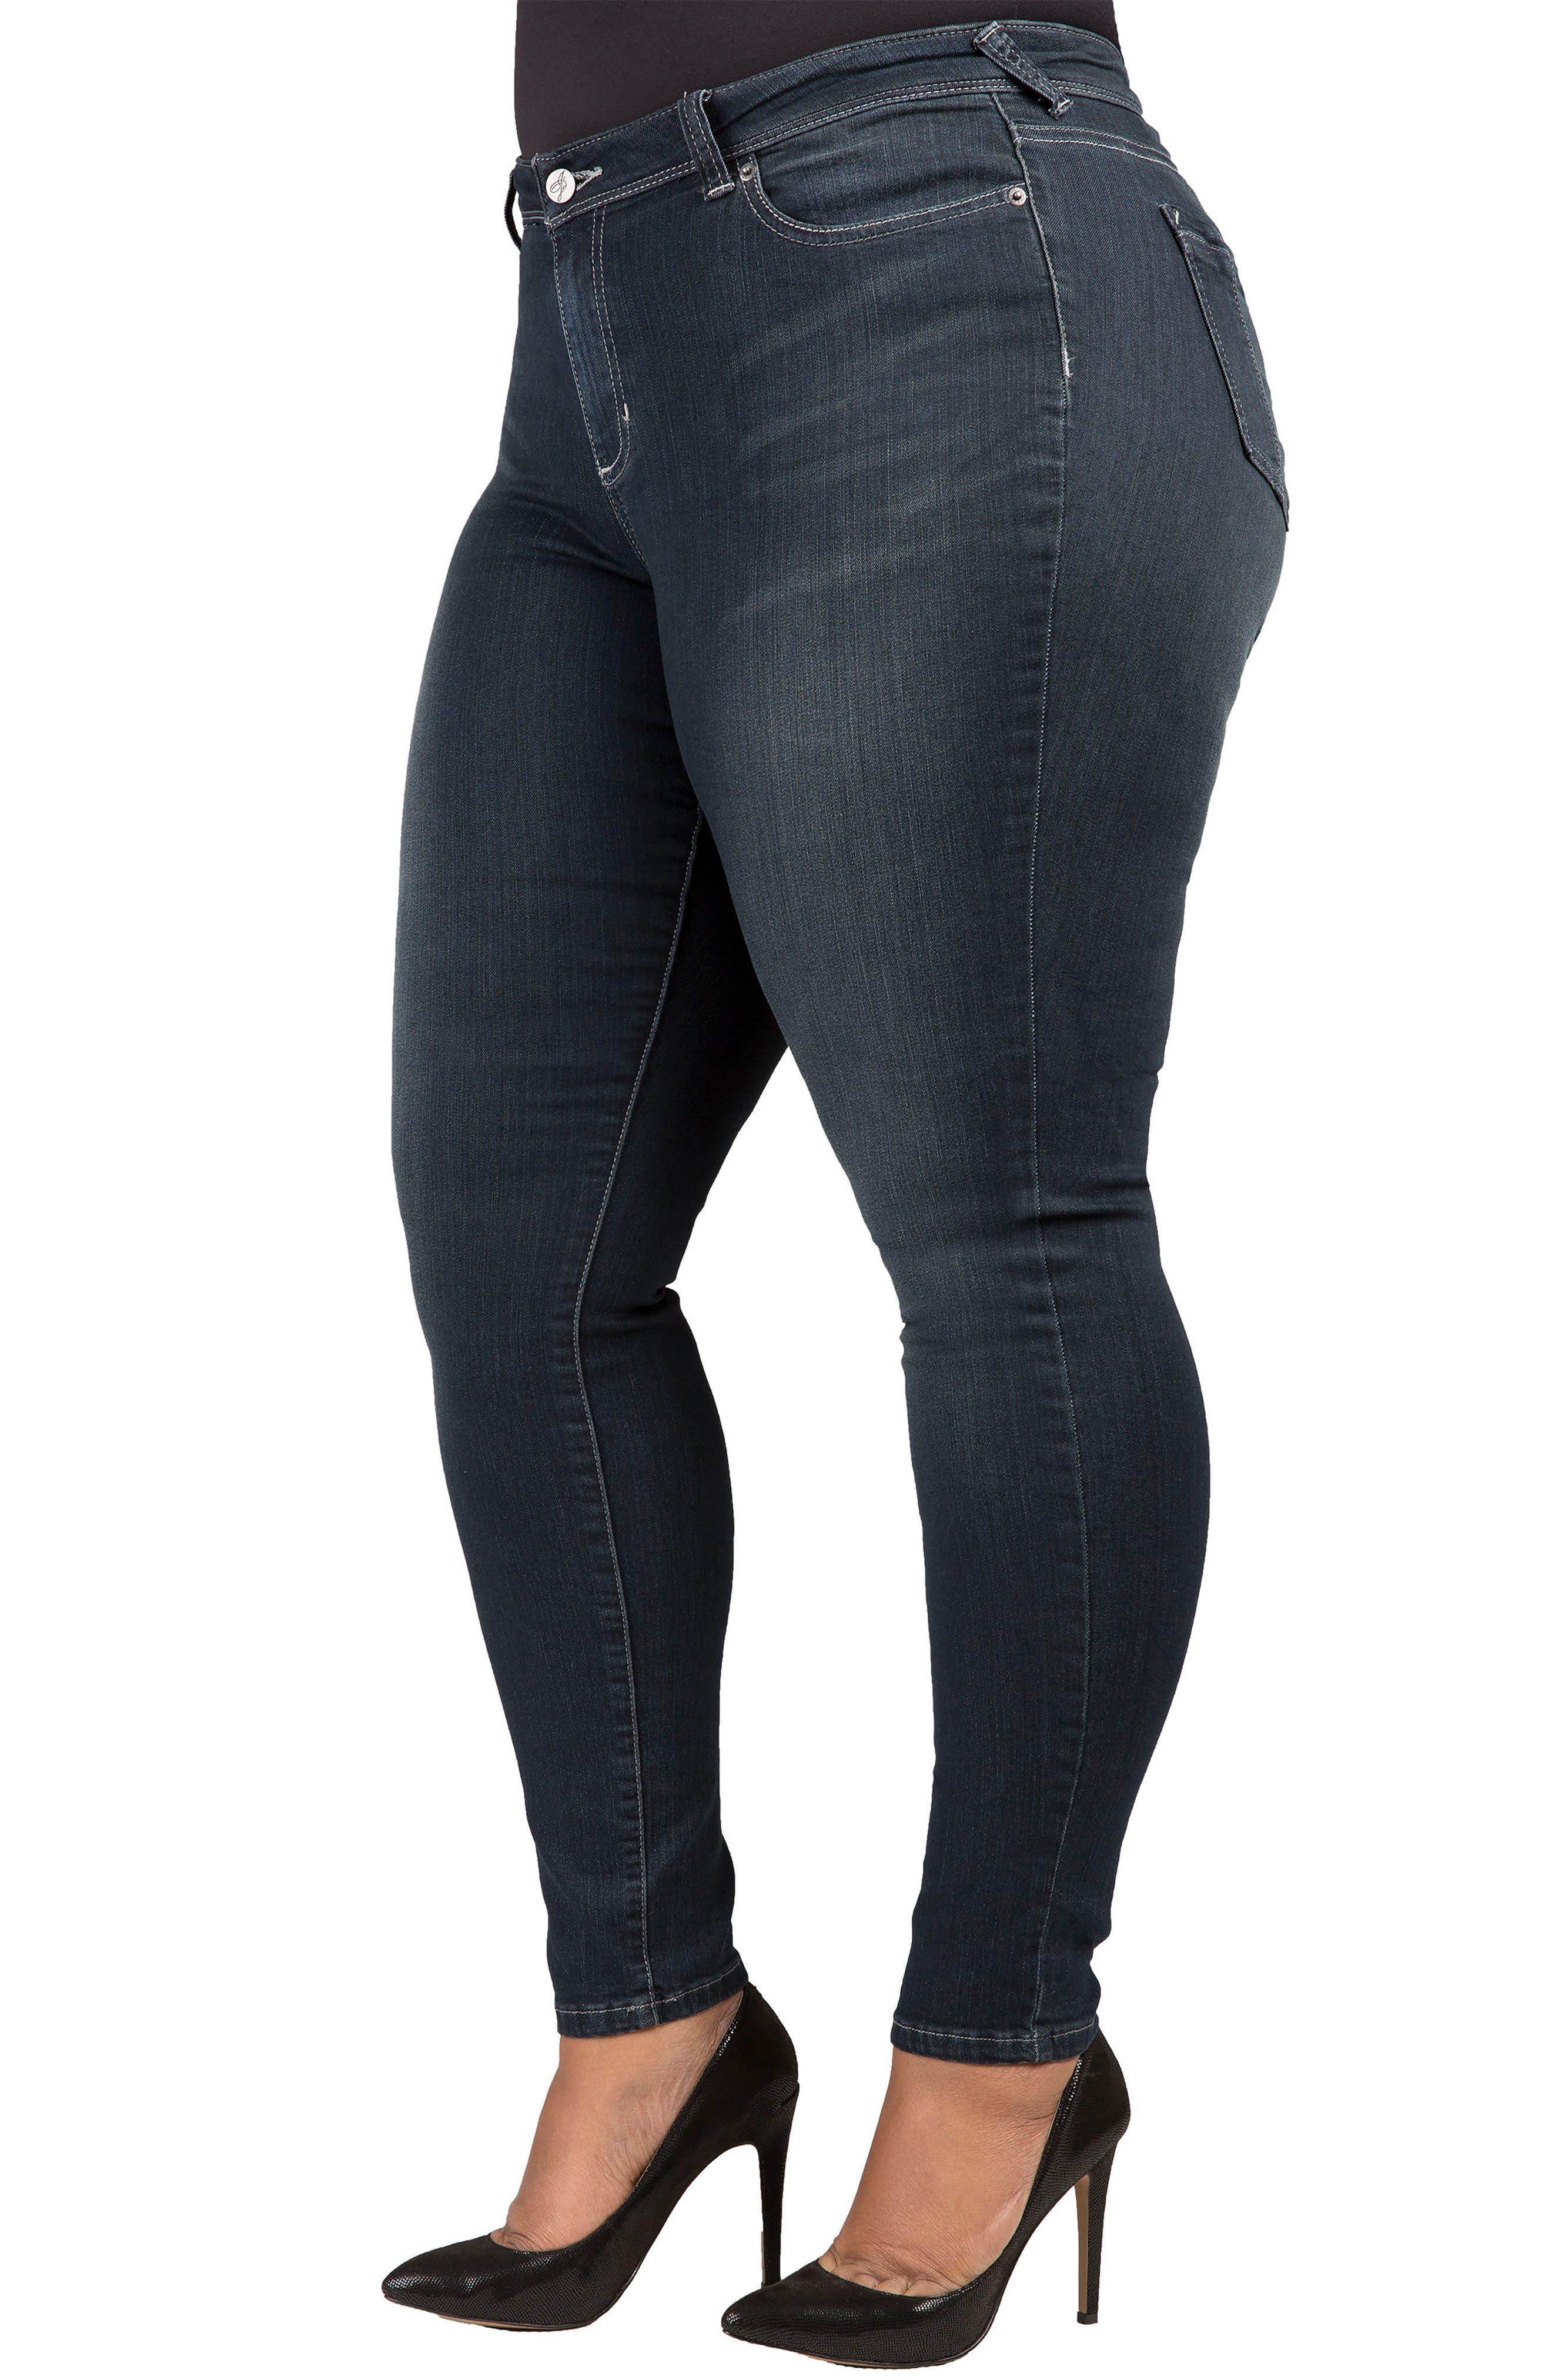 POETIC JUSTICE, 'Maya' Stretch Skinny Jeans, Alternate thumbnail 3, color, 1464KINGSC